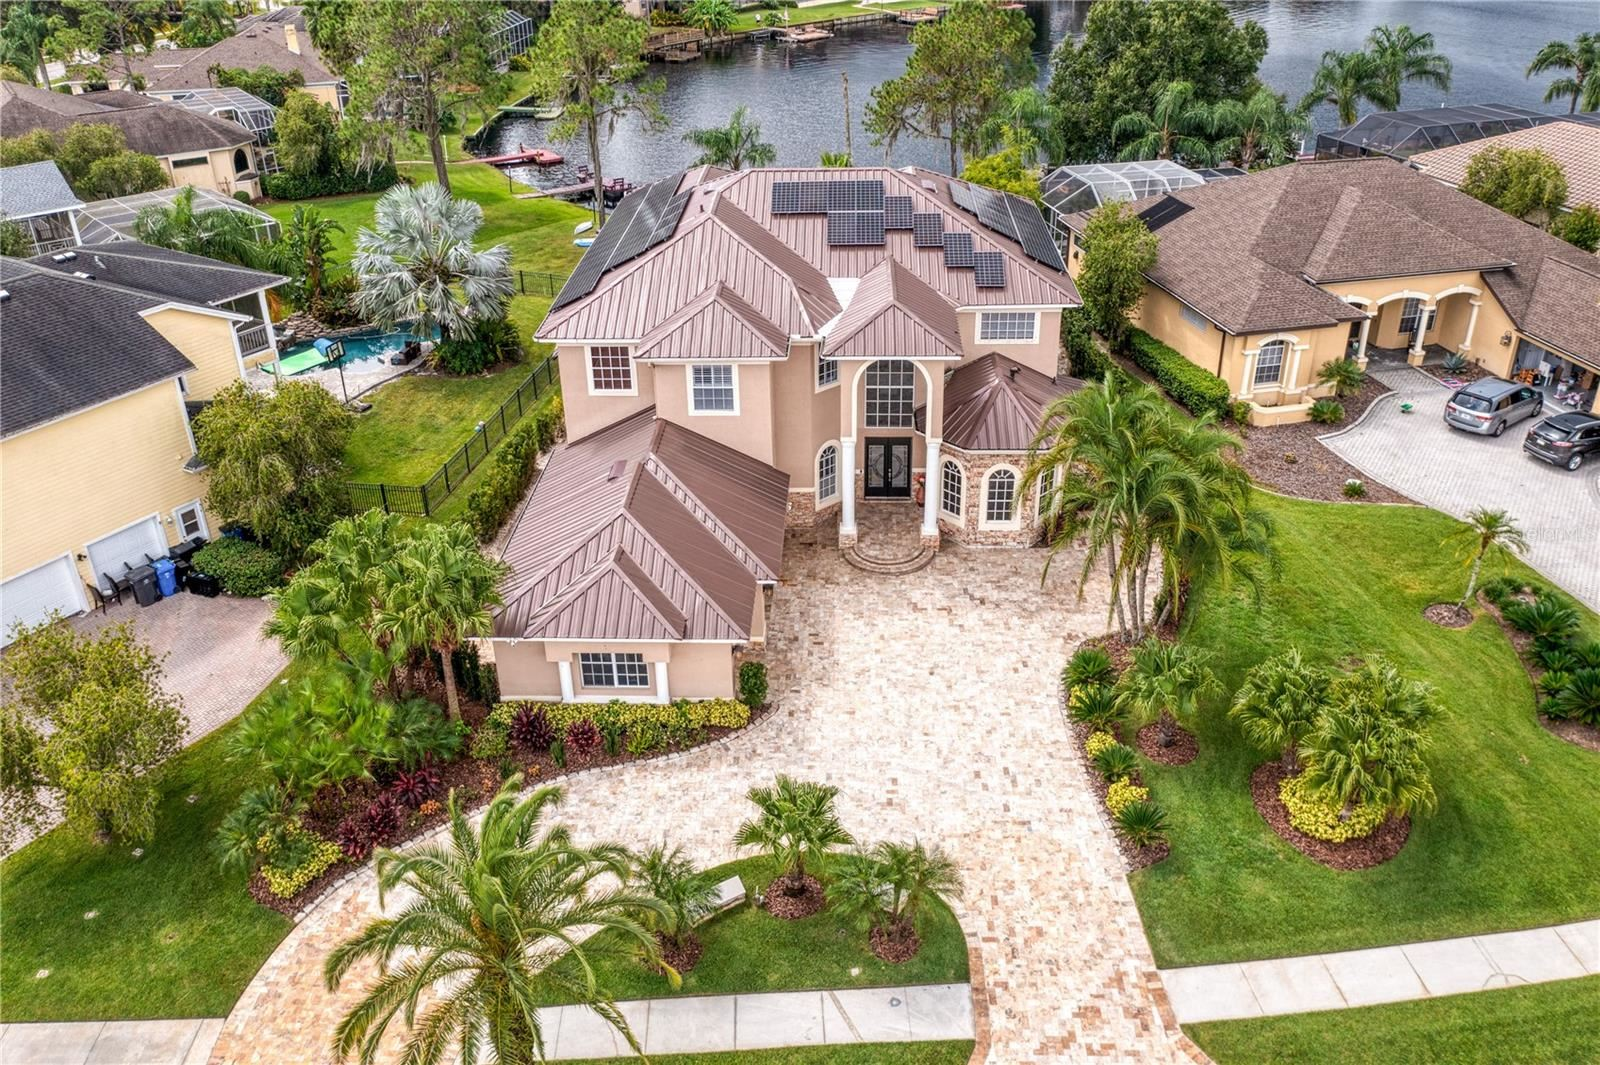 17804 SAINT LUCIA ISLE DRIVE, Tampa, FL 33647 - #: U8139430